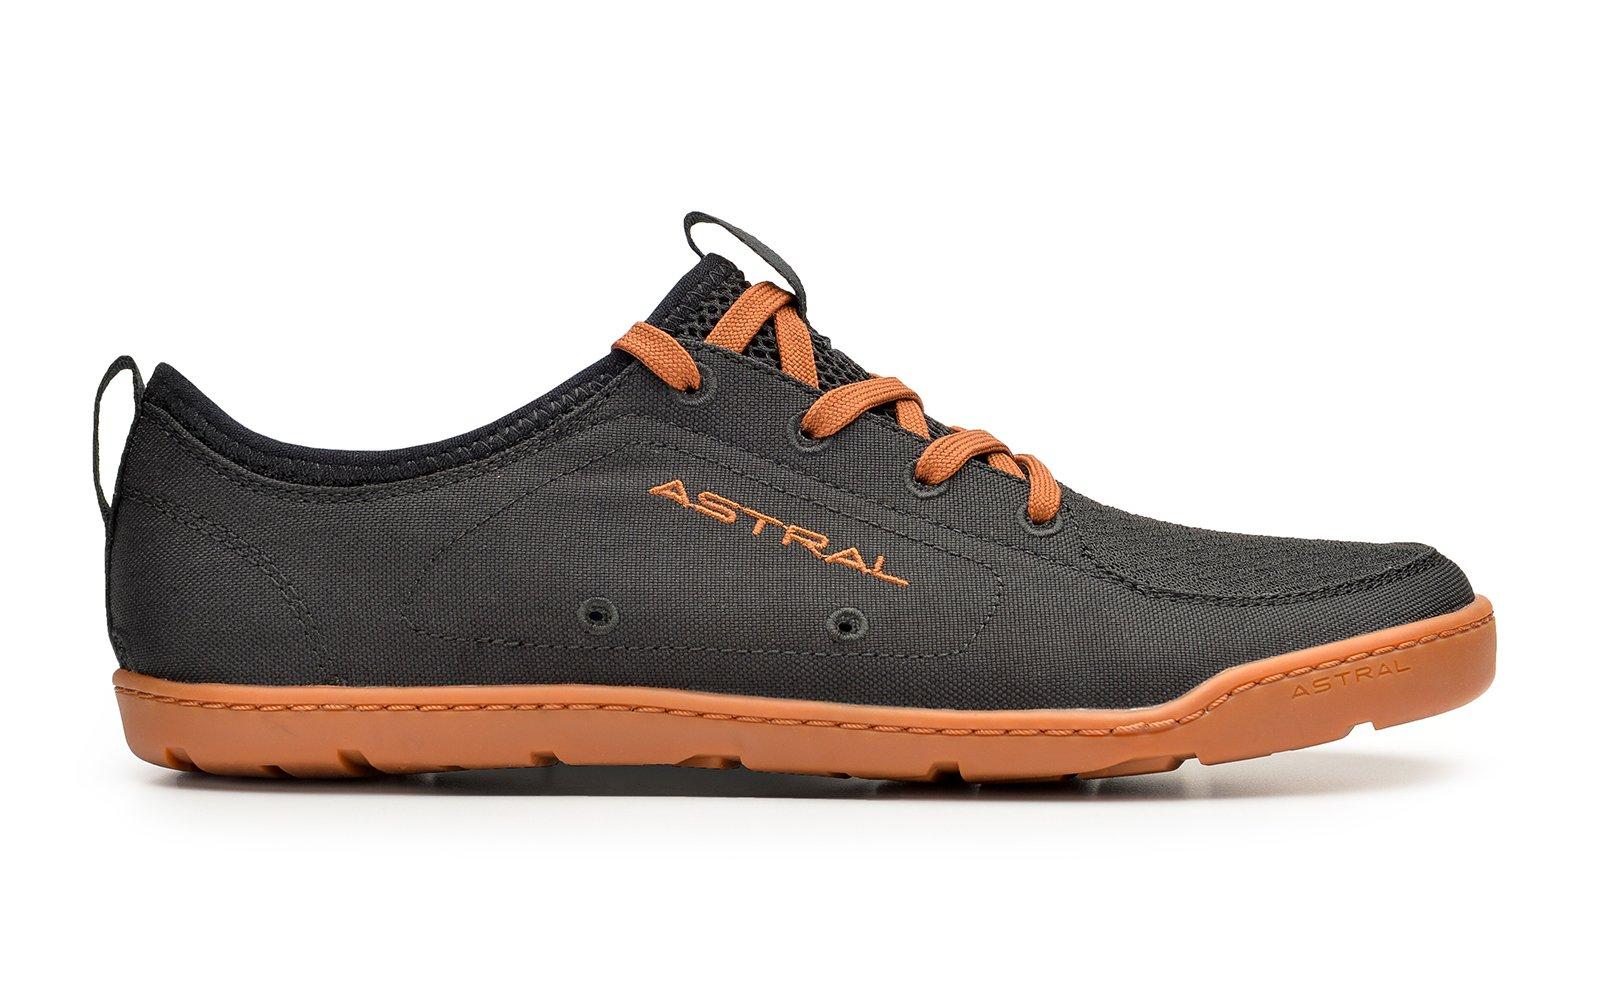 Astral Loyak Men's Water Shoe - Black/Brown - M13